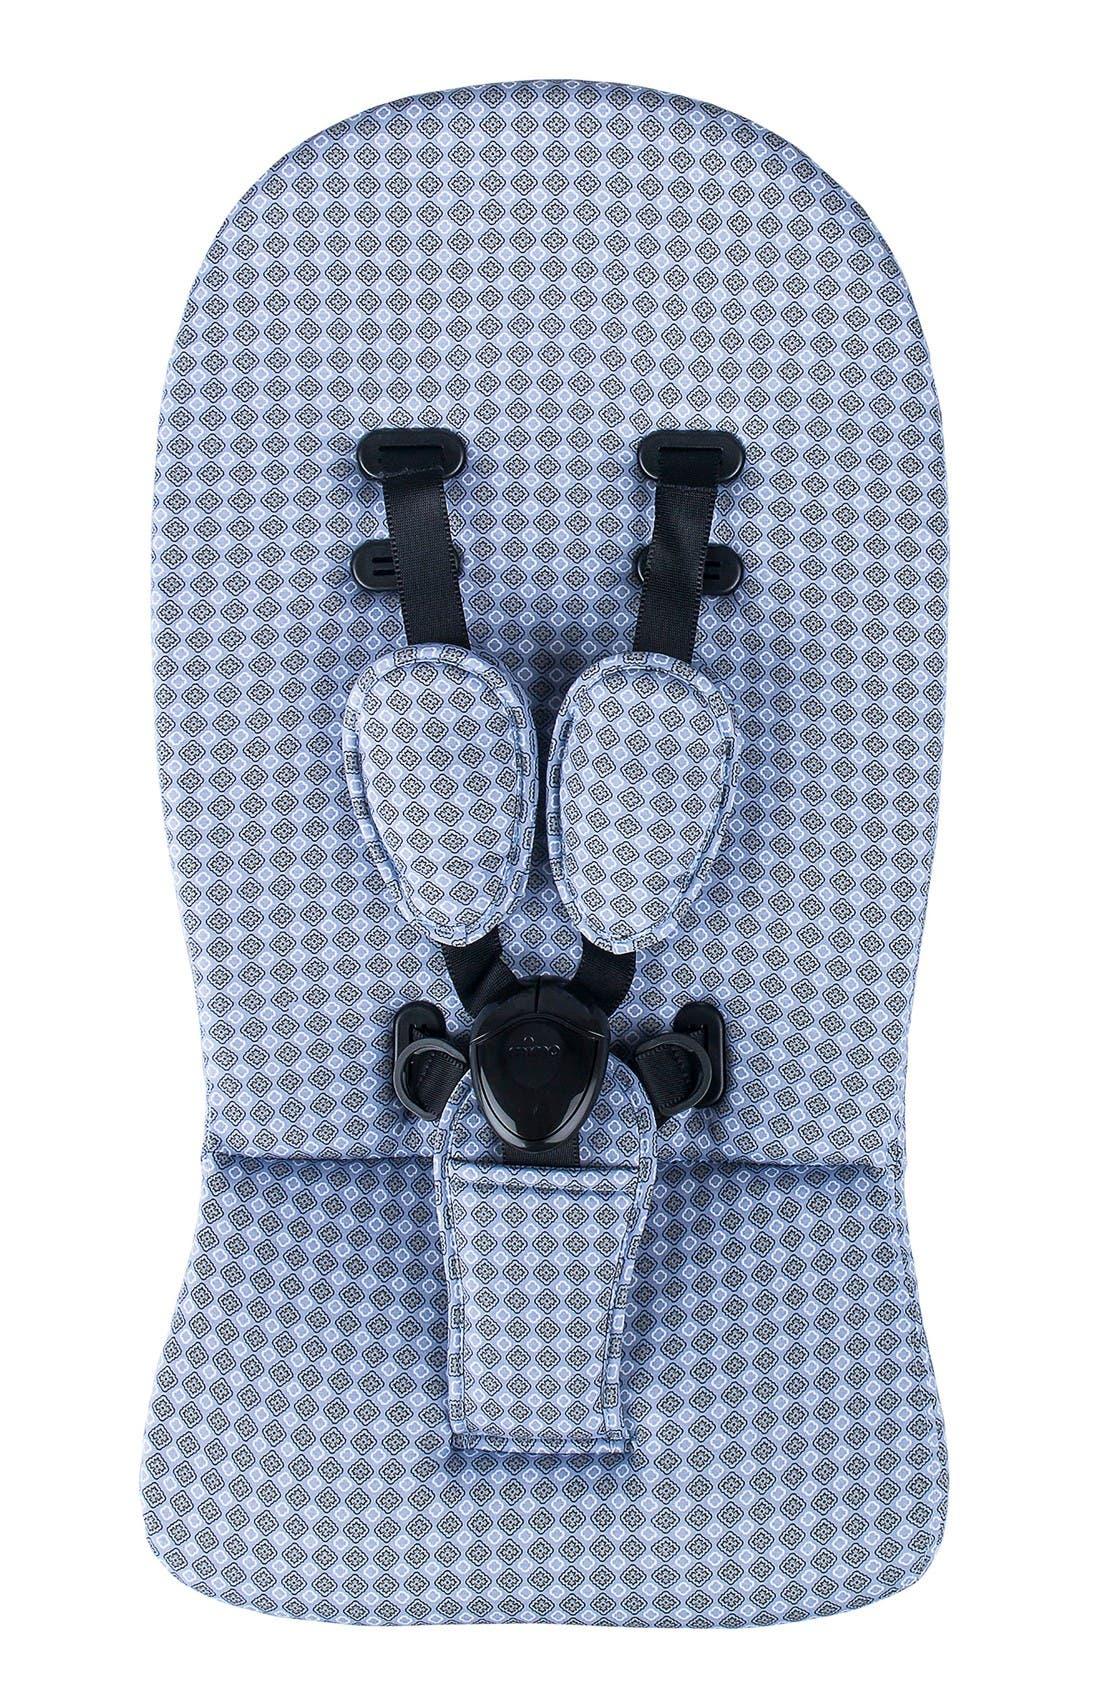 Comfort Padding Kit for Mima Xari or Kobi Strollers,                         Main,                         color, Retro Blue